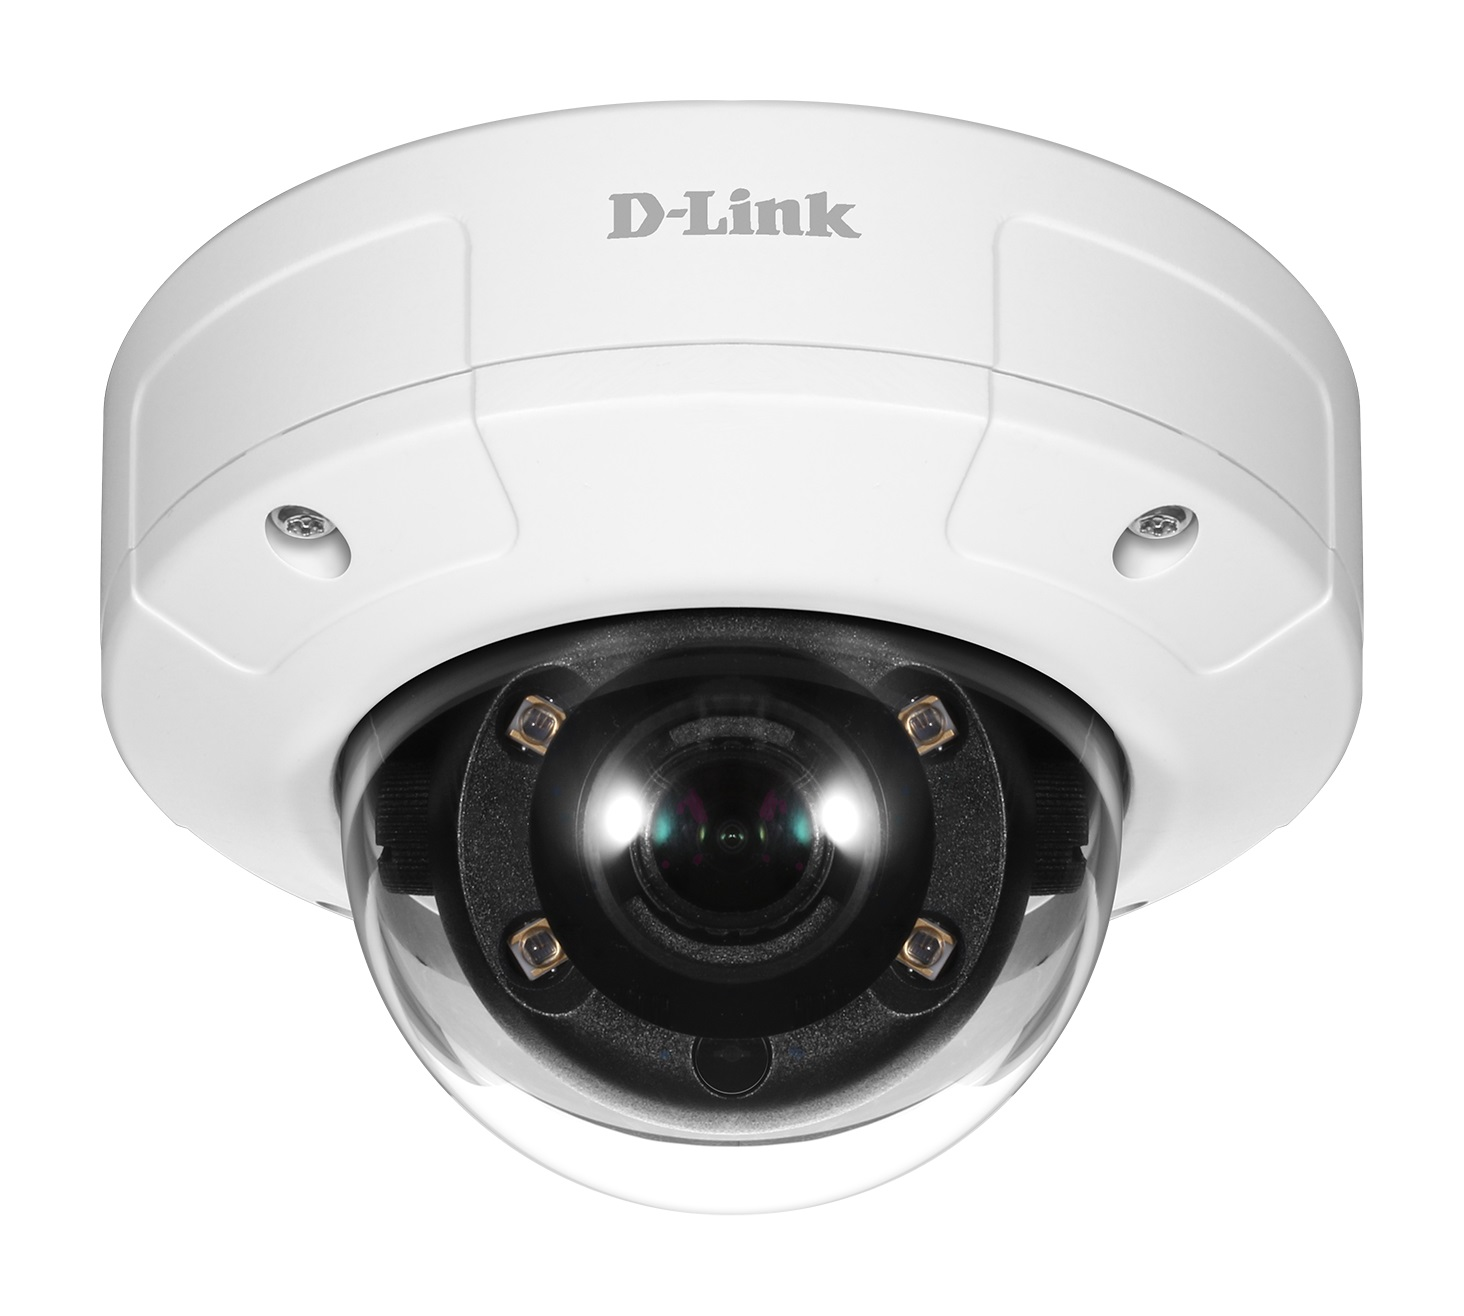 D-Link DCS-4602EV Full HD Outdoor Vandal Proof PoE Dome Camera